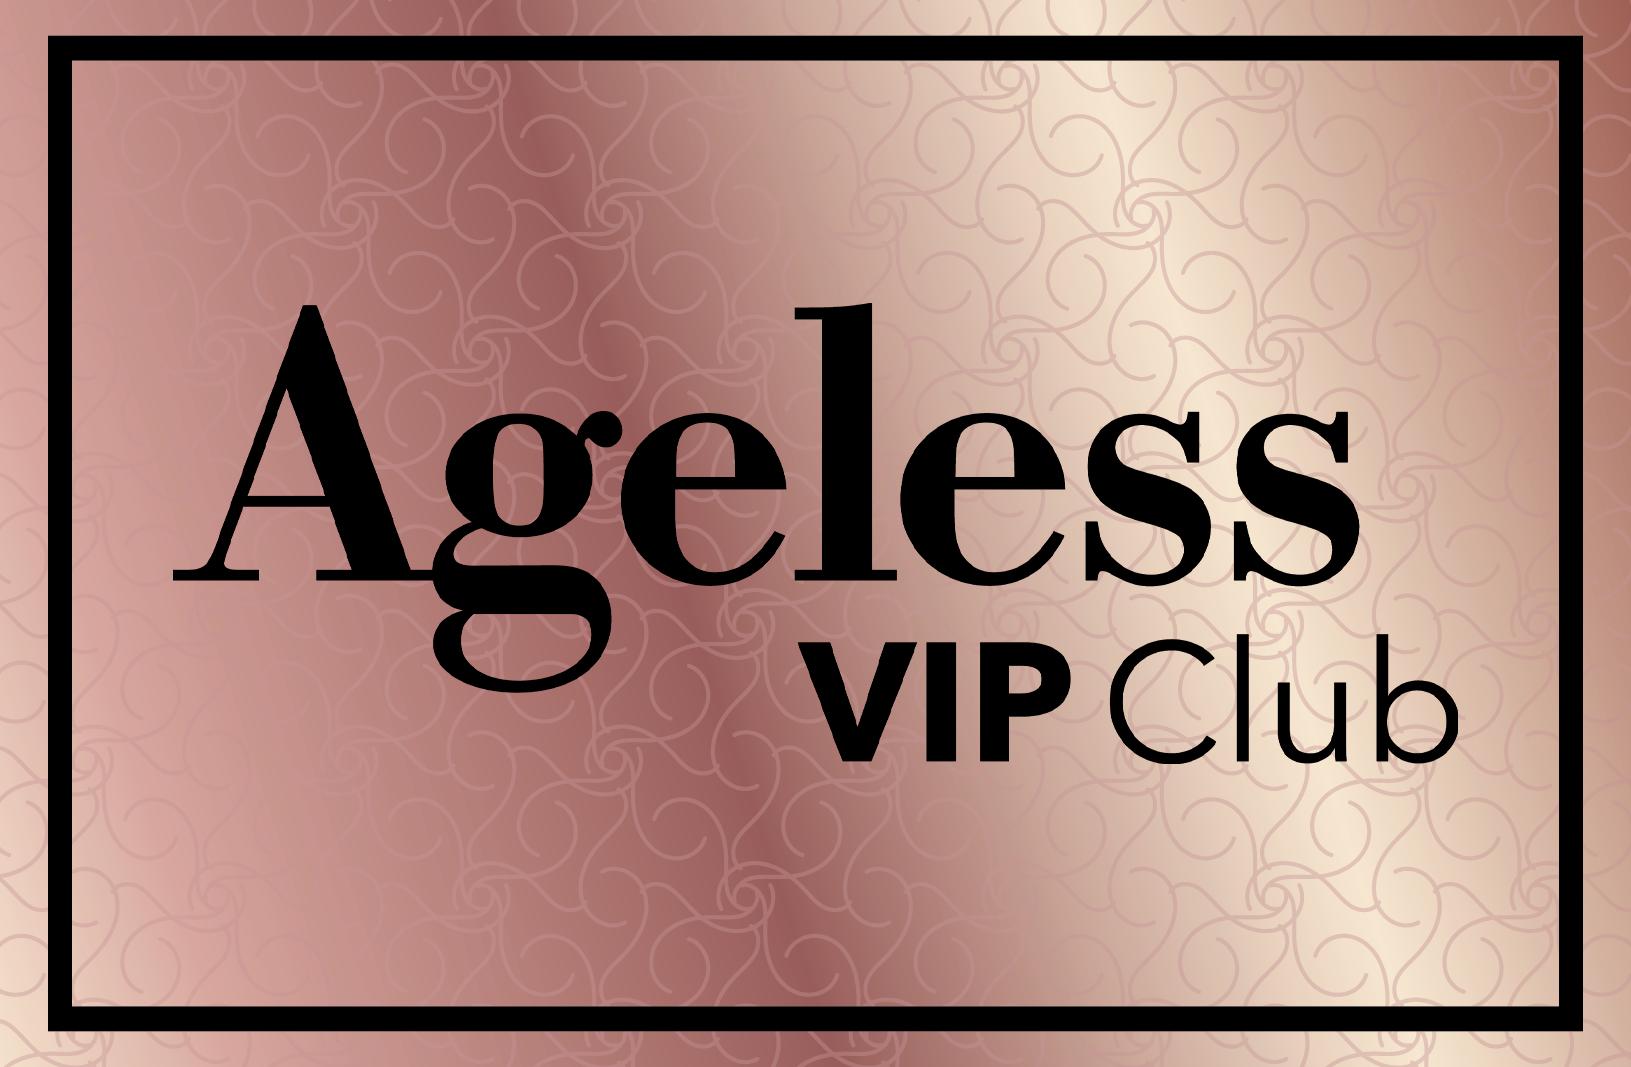 Ageless VIP Club Logo